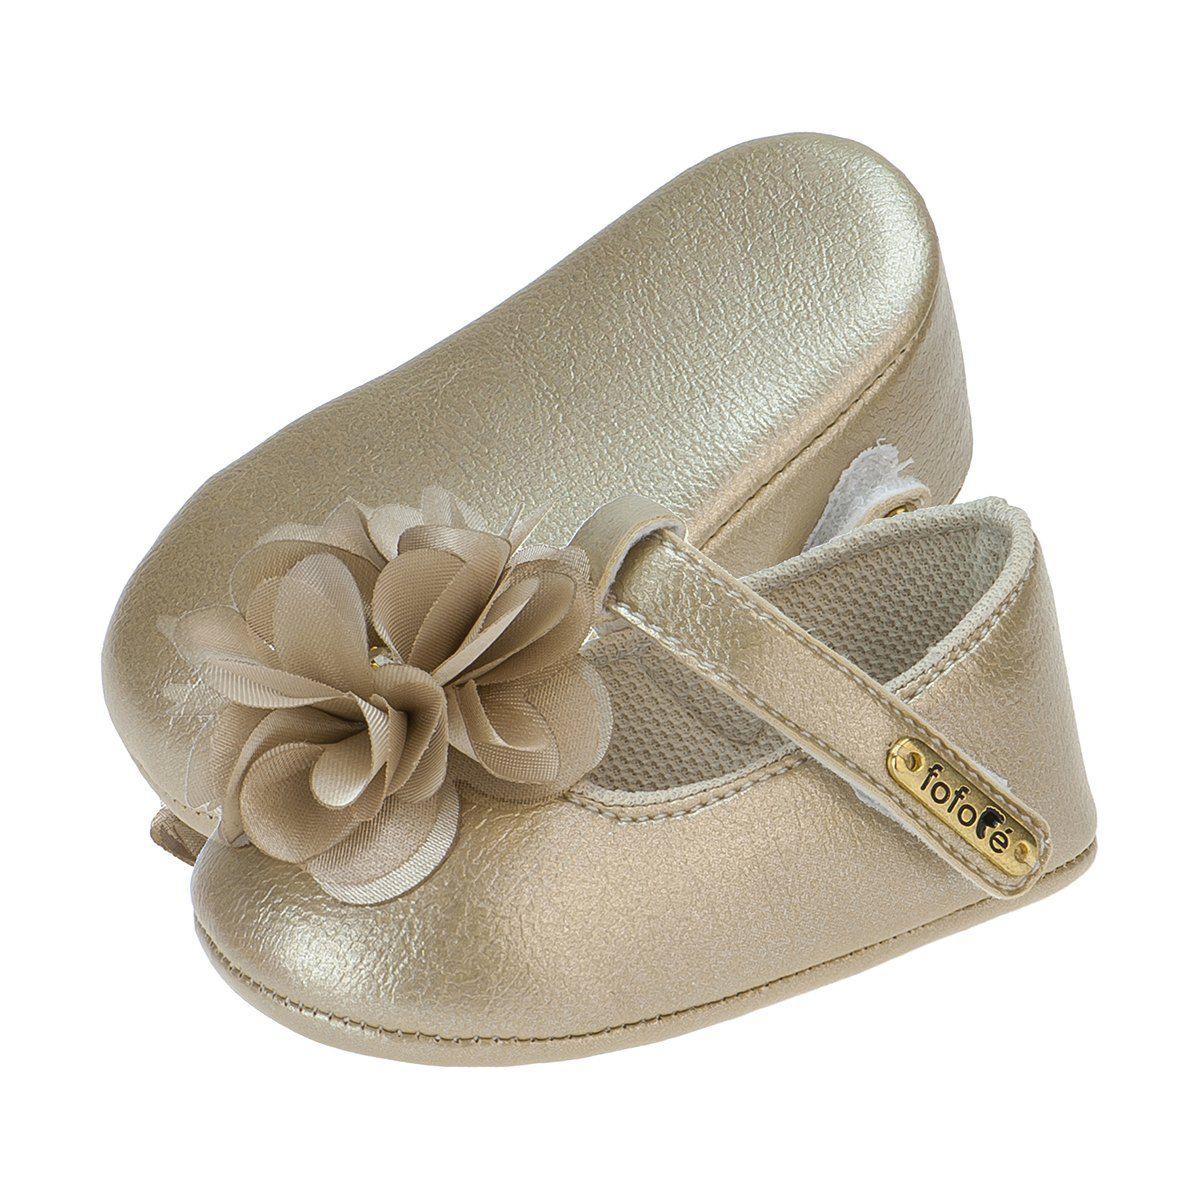 Sapato Boneca Menina Flor Dourada - FOFOPÉ